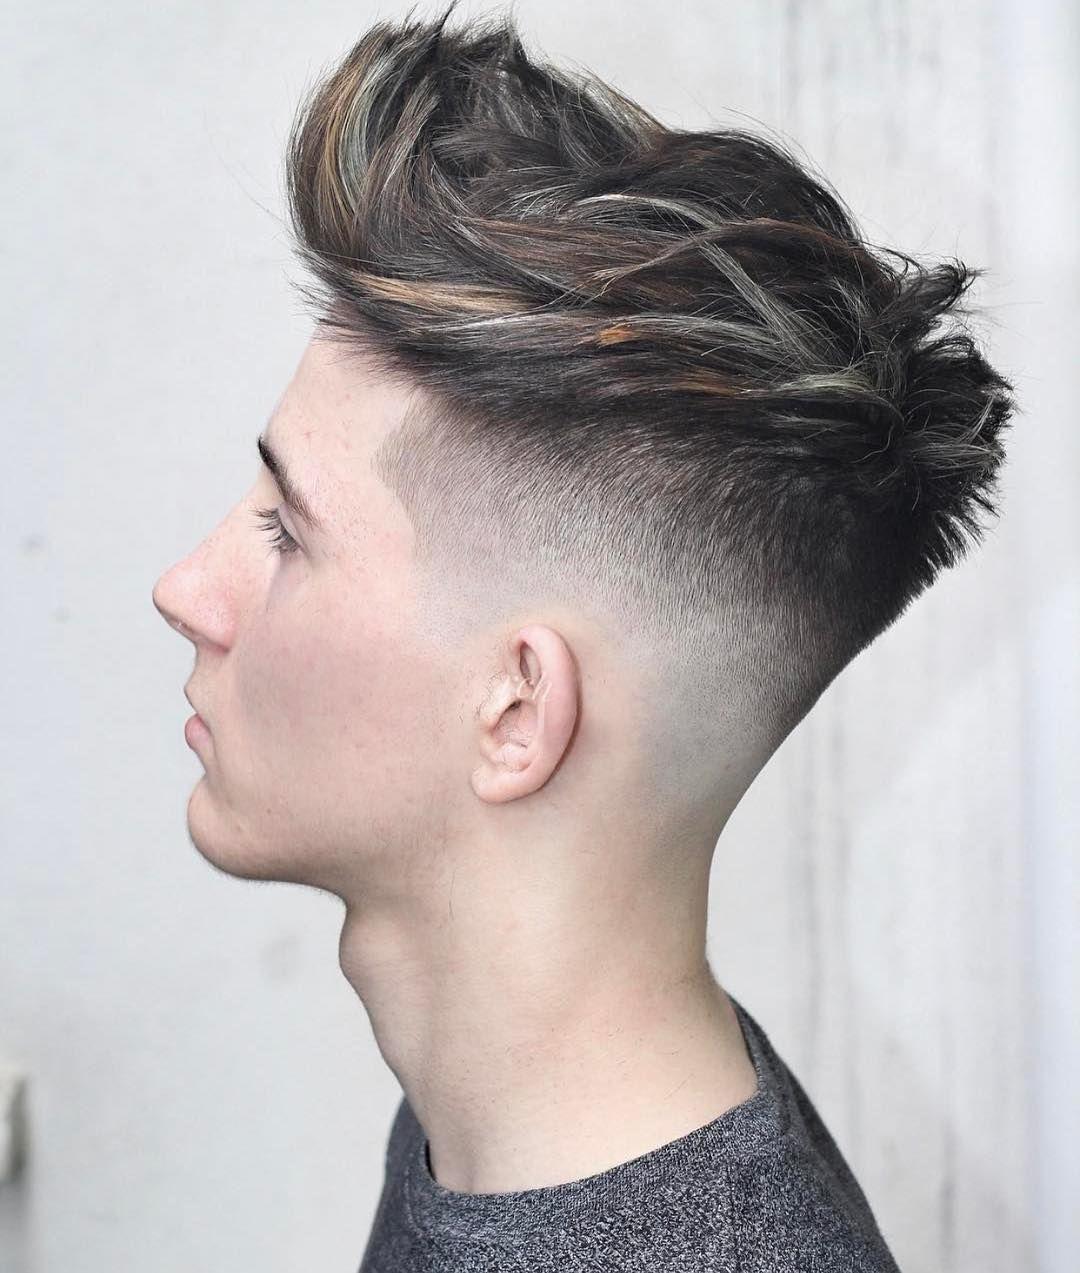 Mens haircut diagram magdalena mendez maggifashion on pinterest